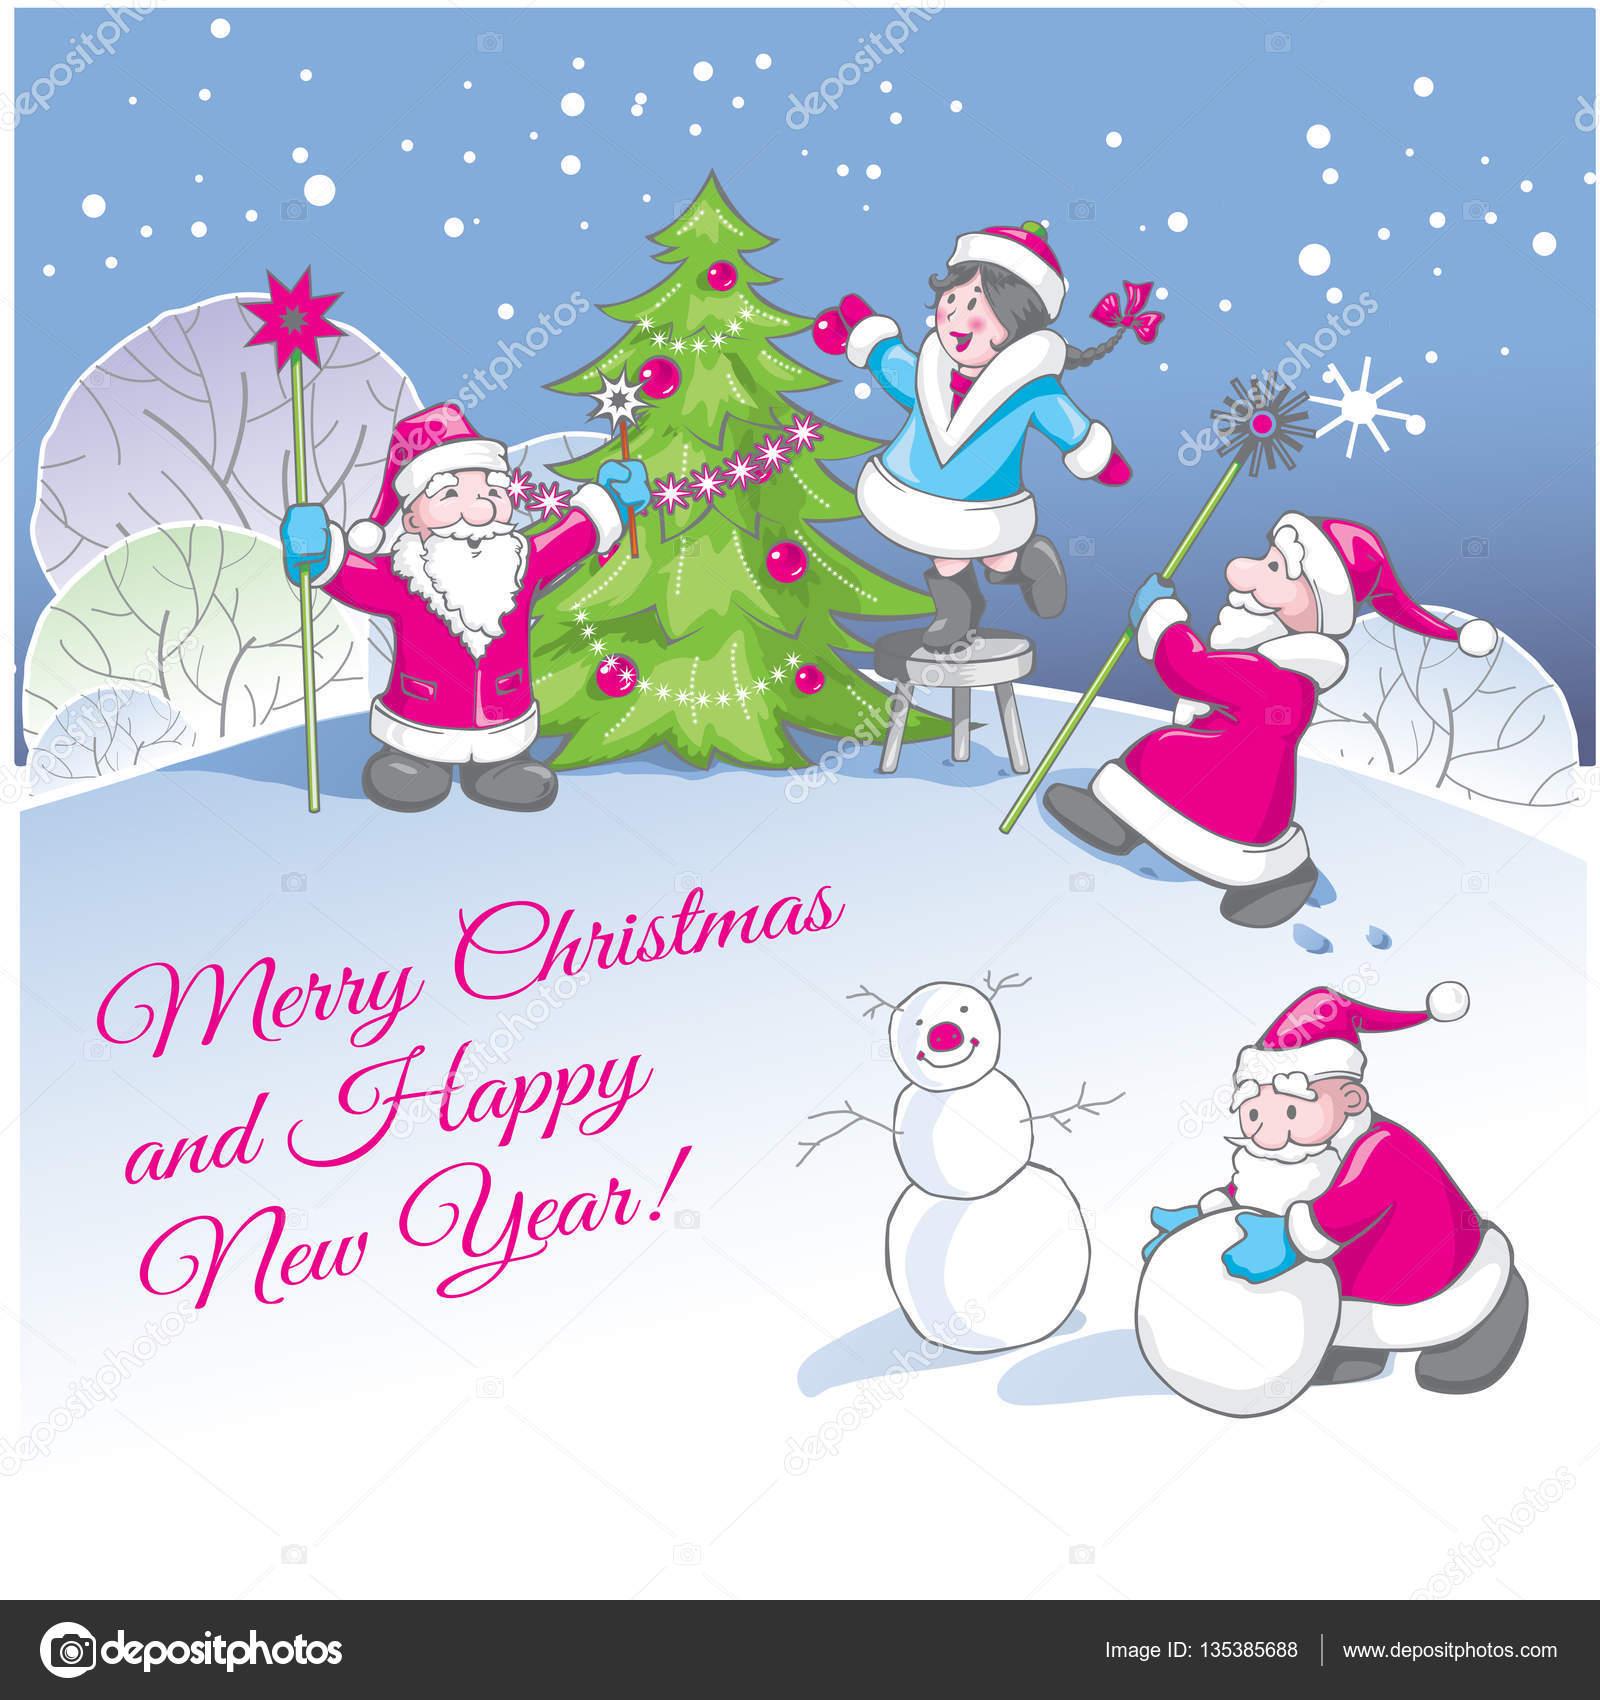 greeting christmas and new year card with funny cartoon santas stock vector